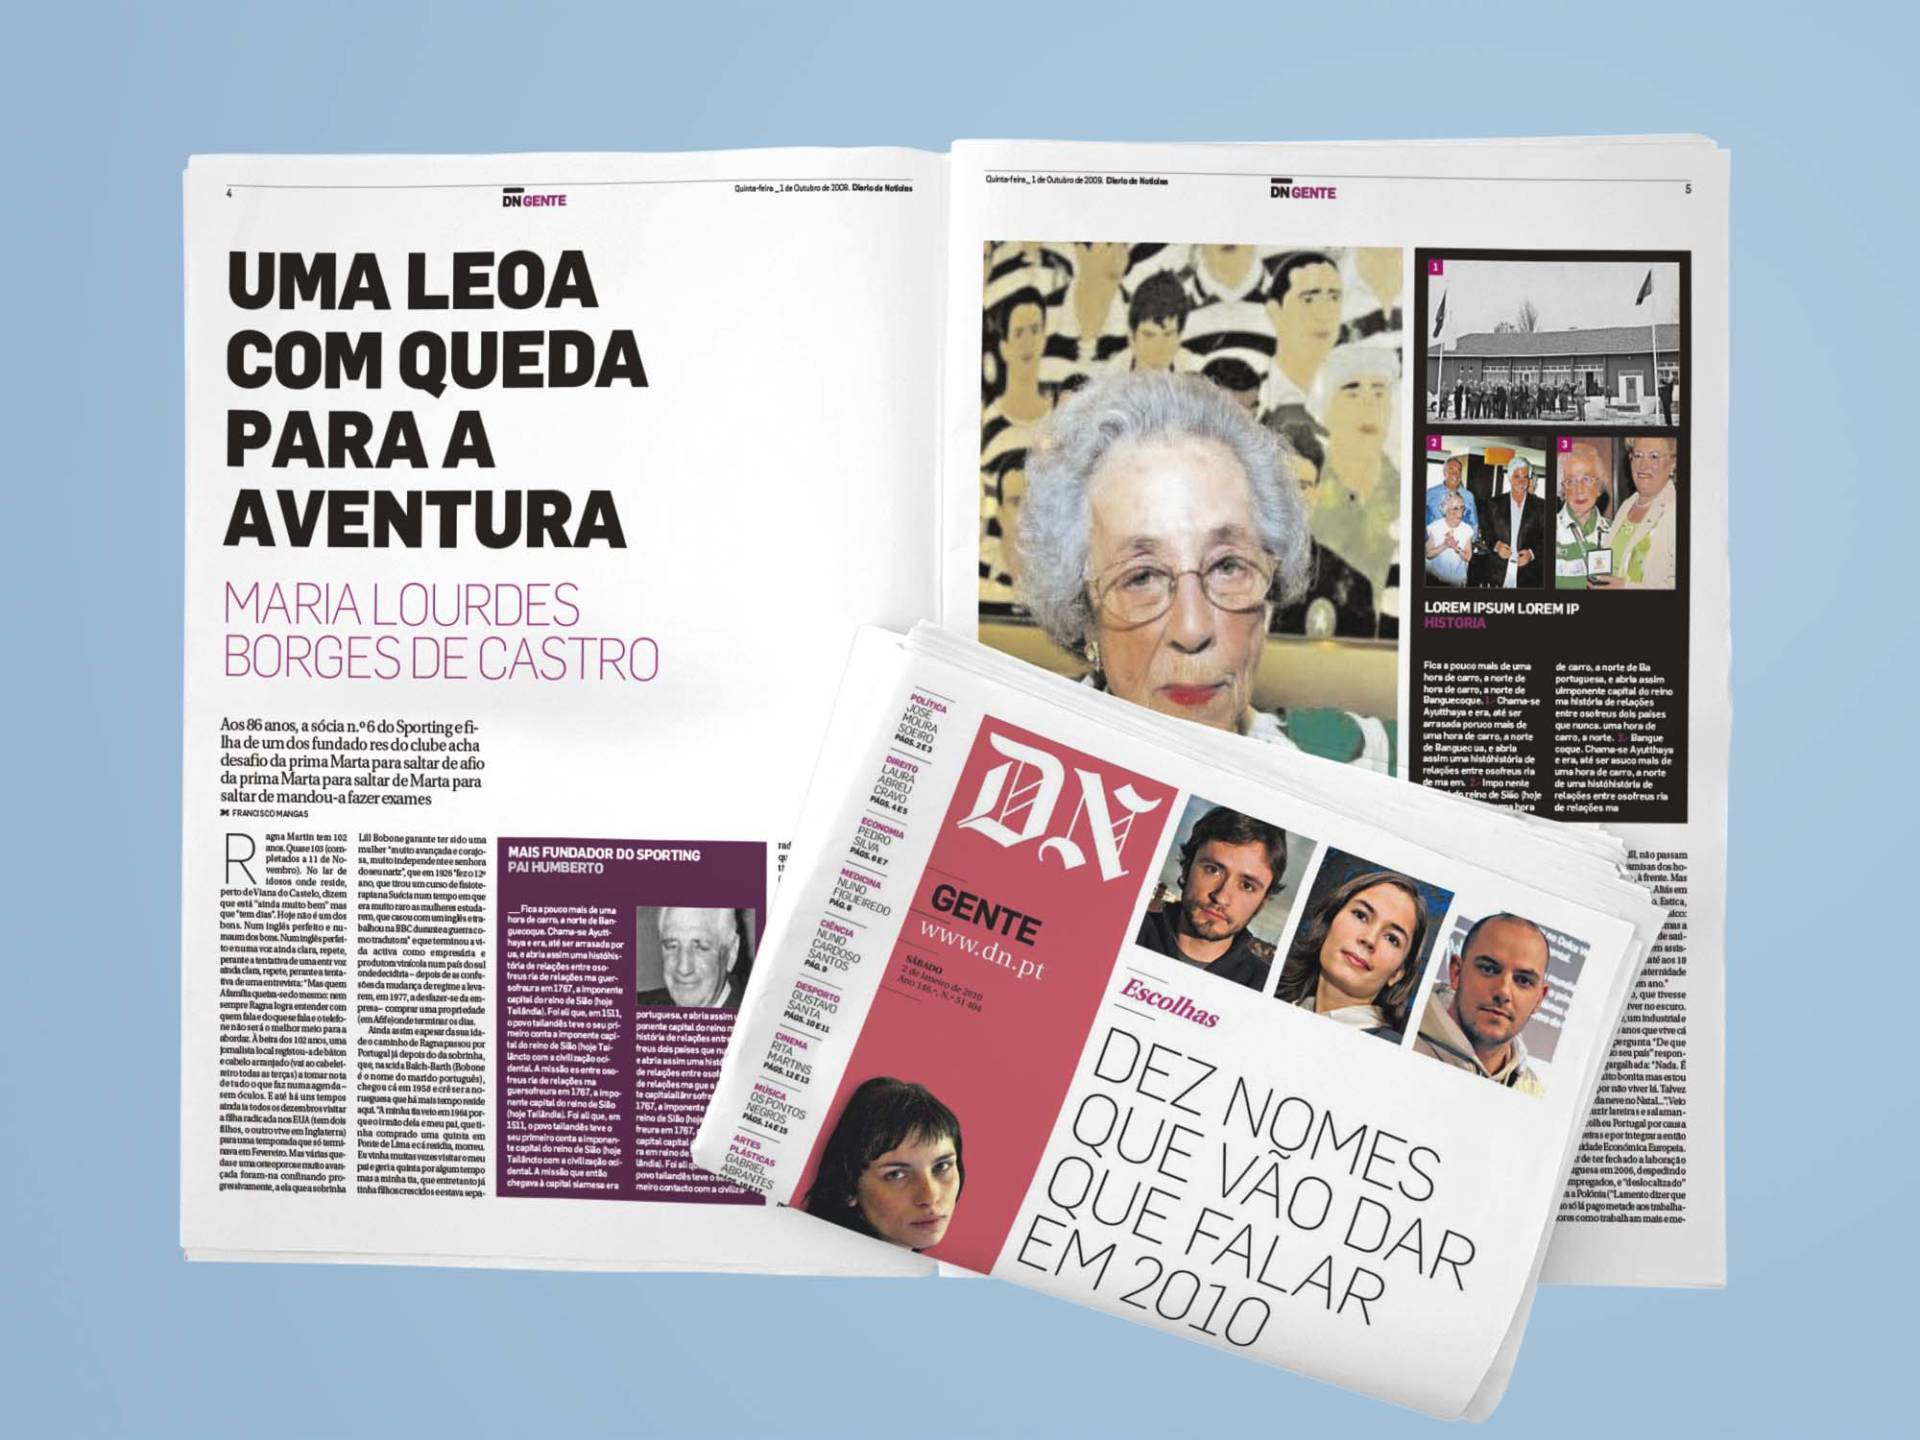 Diario_De_Noticias_06_Wenceslau_News_Design